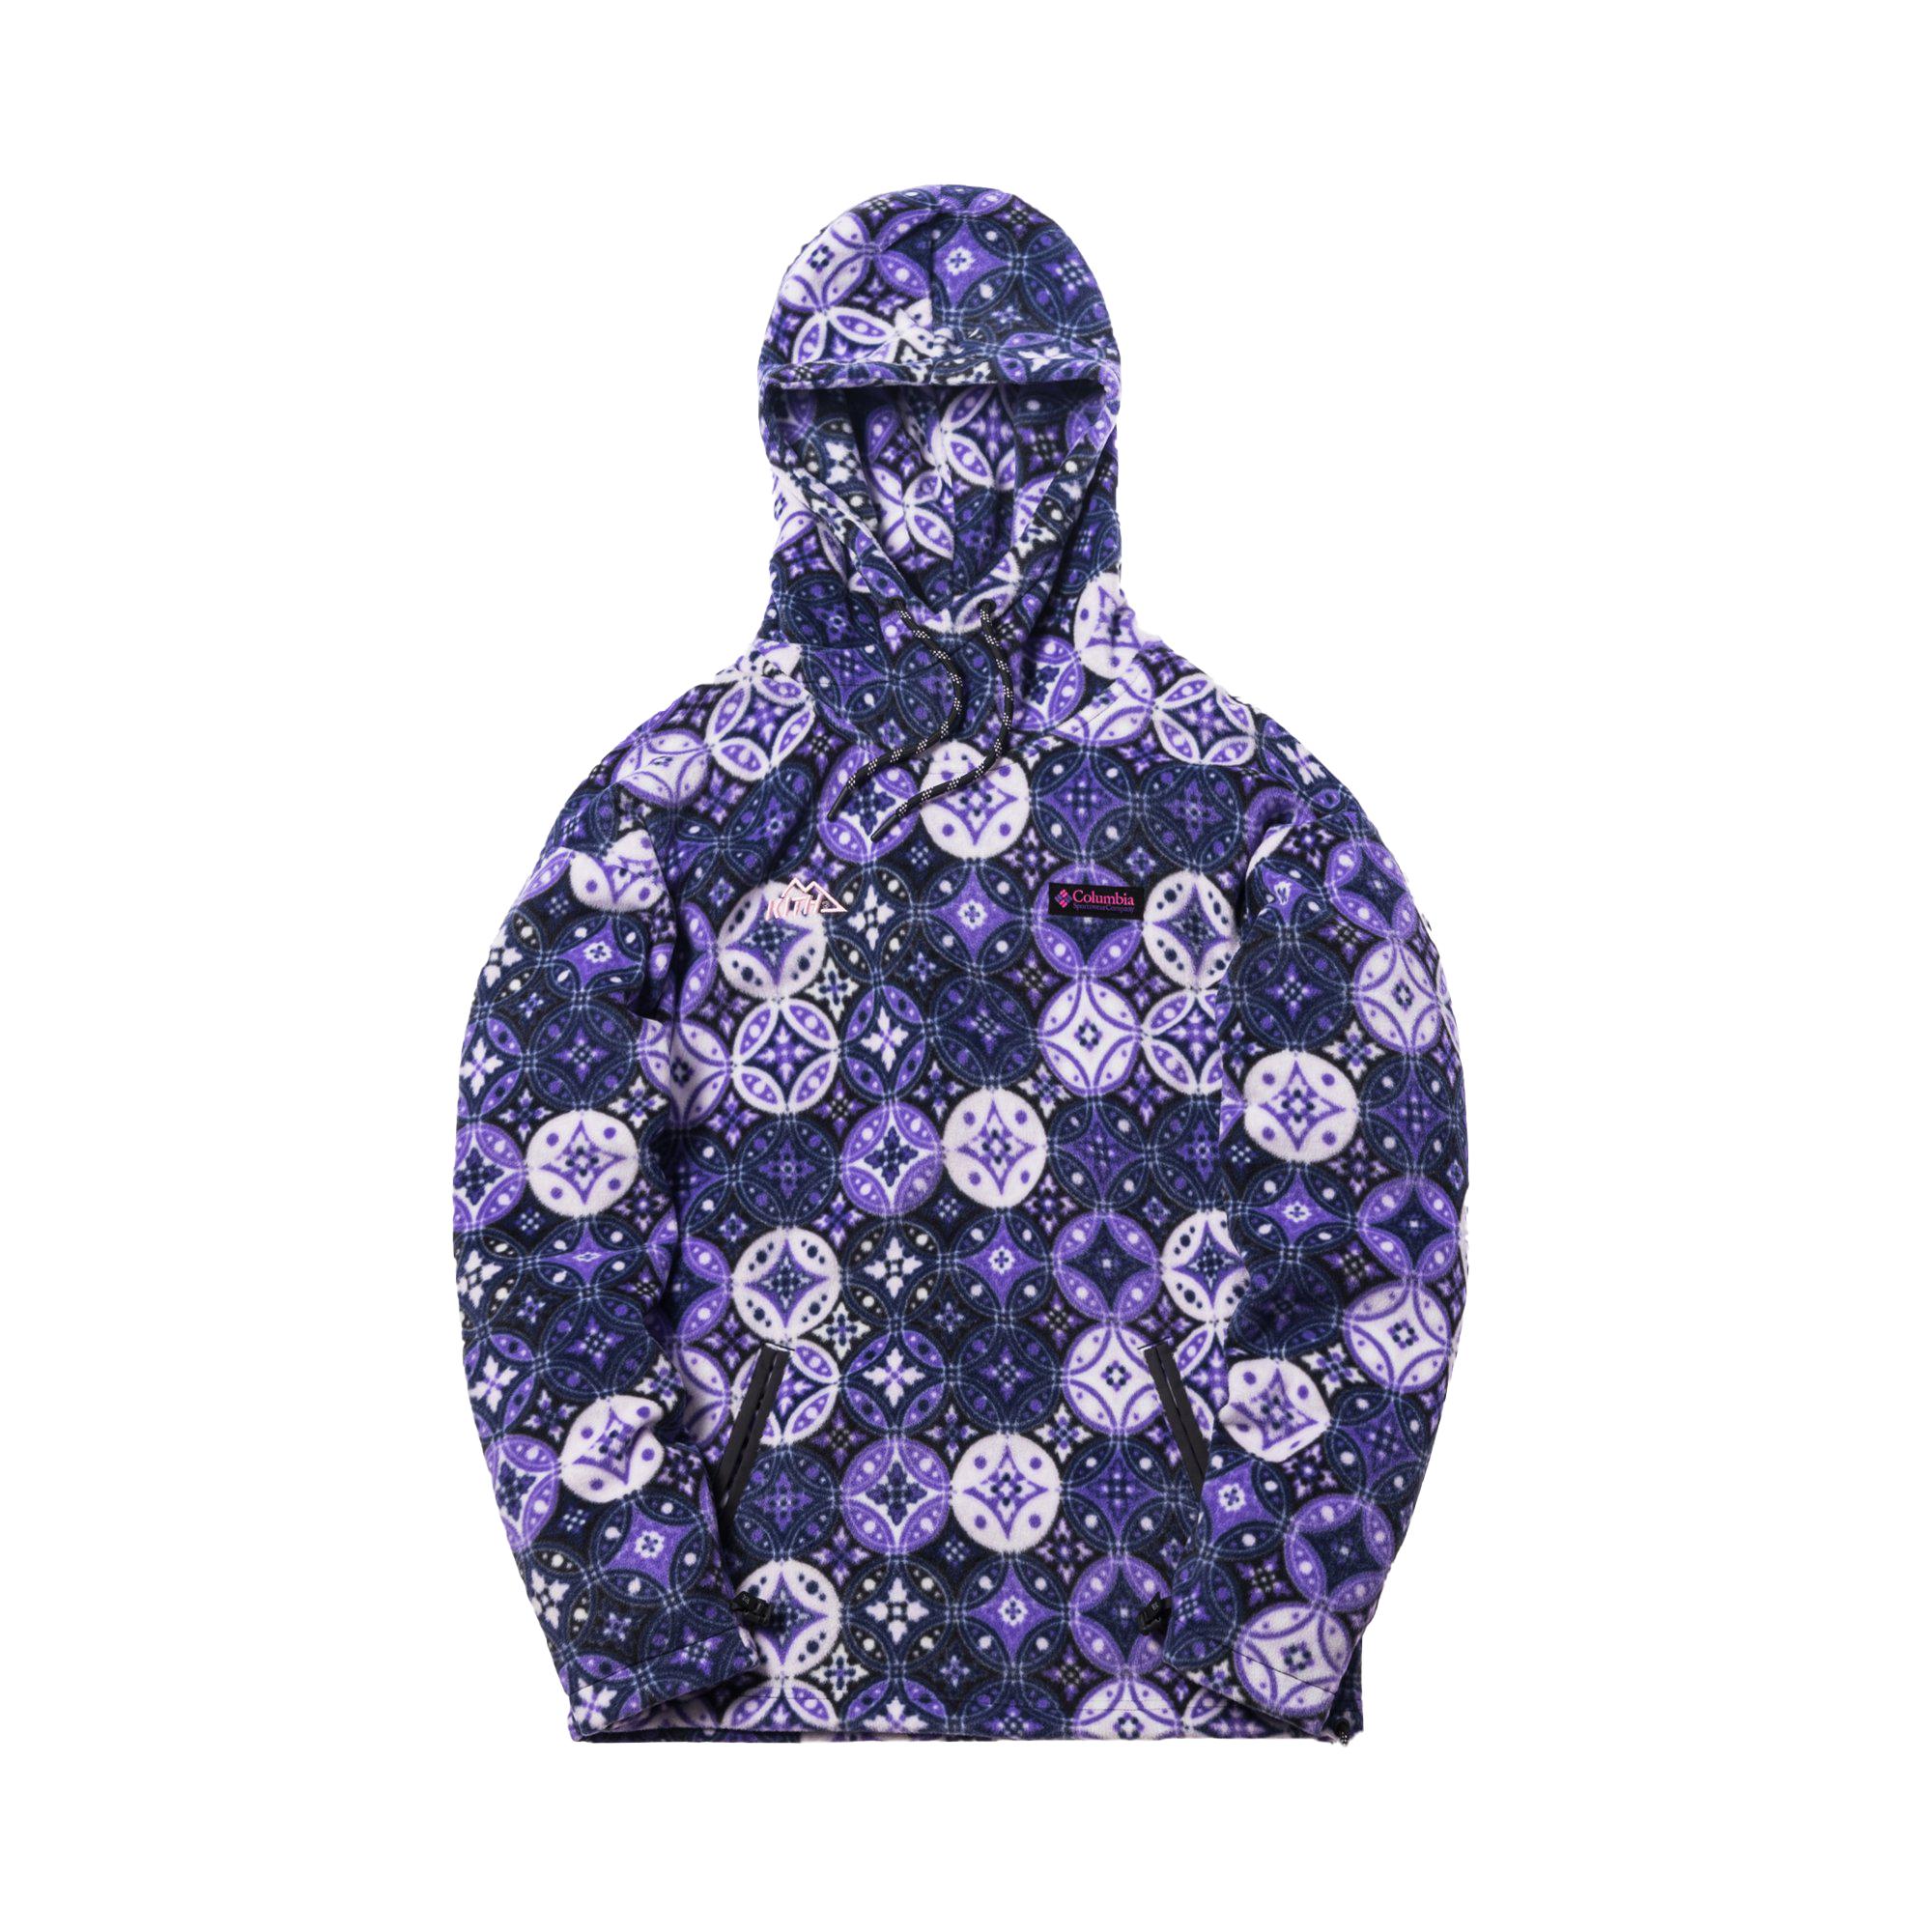 Kith x Columbia Fleece Hoodie Emperor Purple